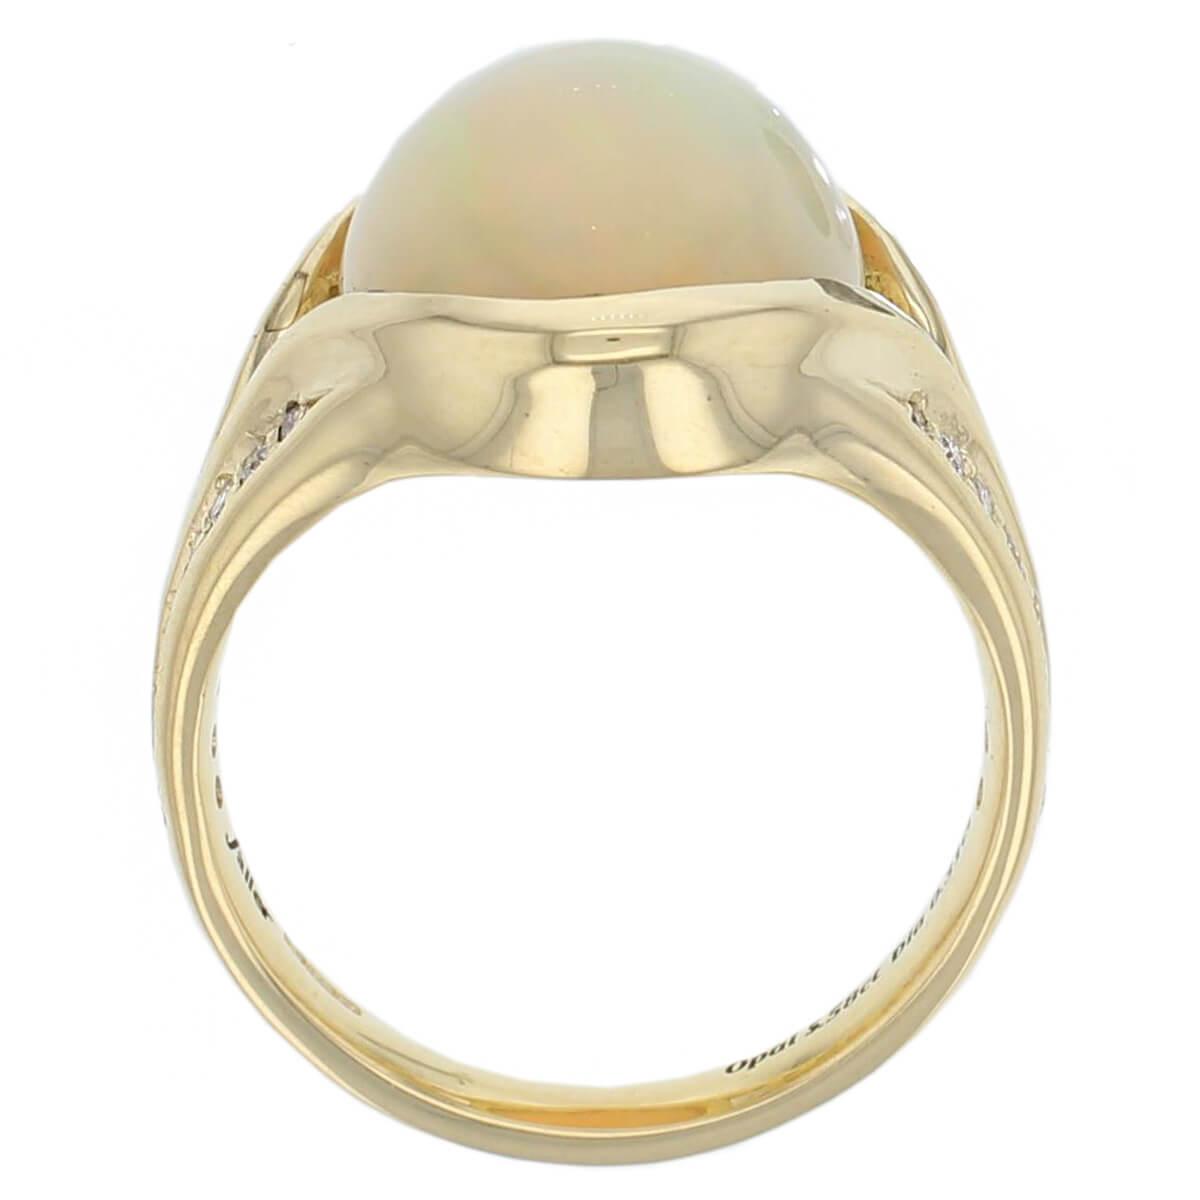 opal diamond ring, 18ct yellow gold oval cut cabochon opal gemstone & diamond multistone dress ring, designer jewellery, gem, jewelry, handmade by Faller, Londonderry, Northern Ireland, Irish hand crafted, shoulder set